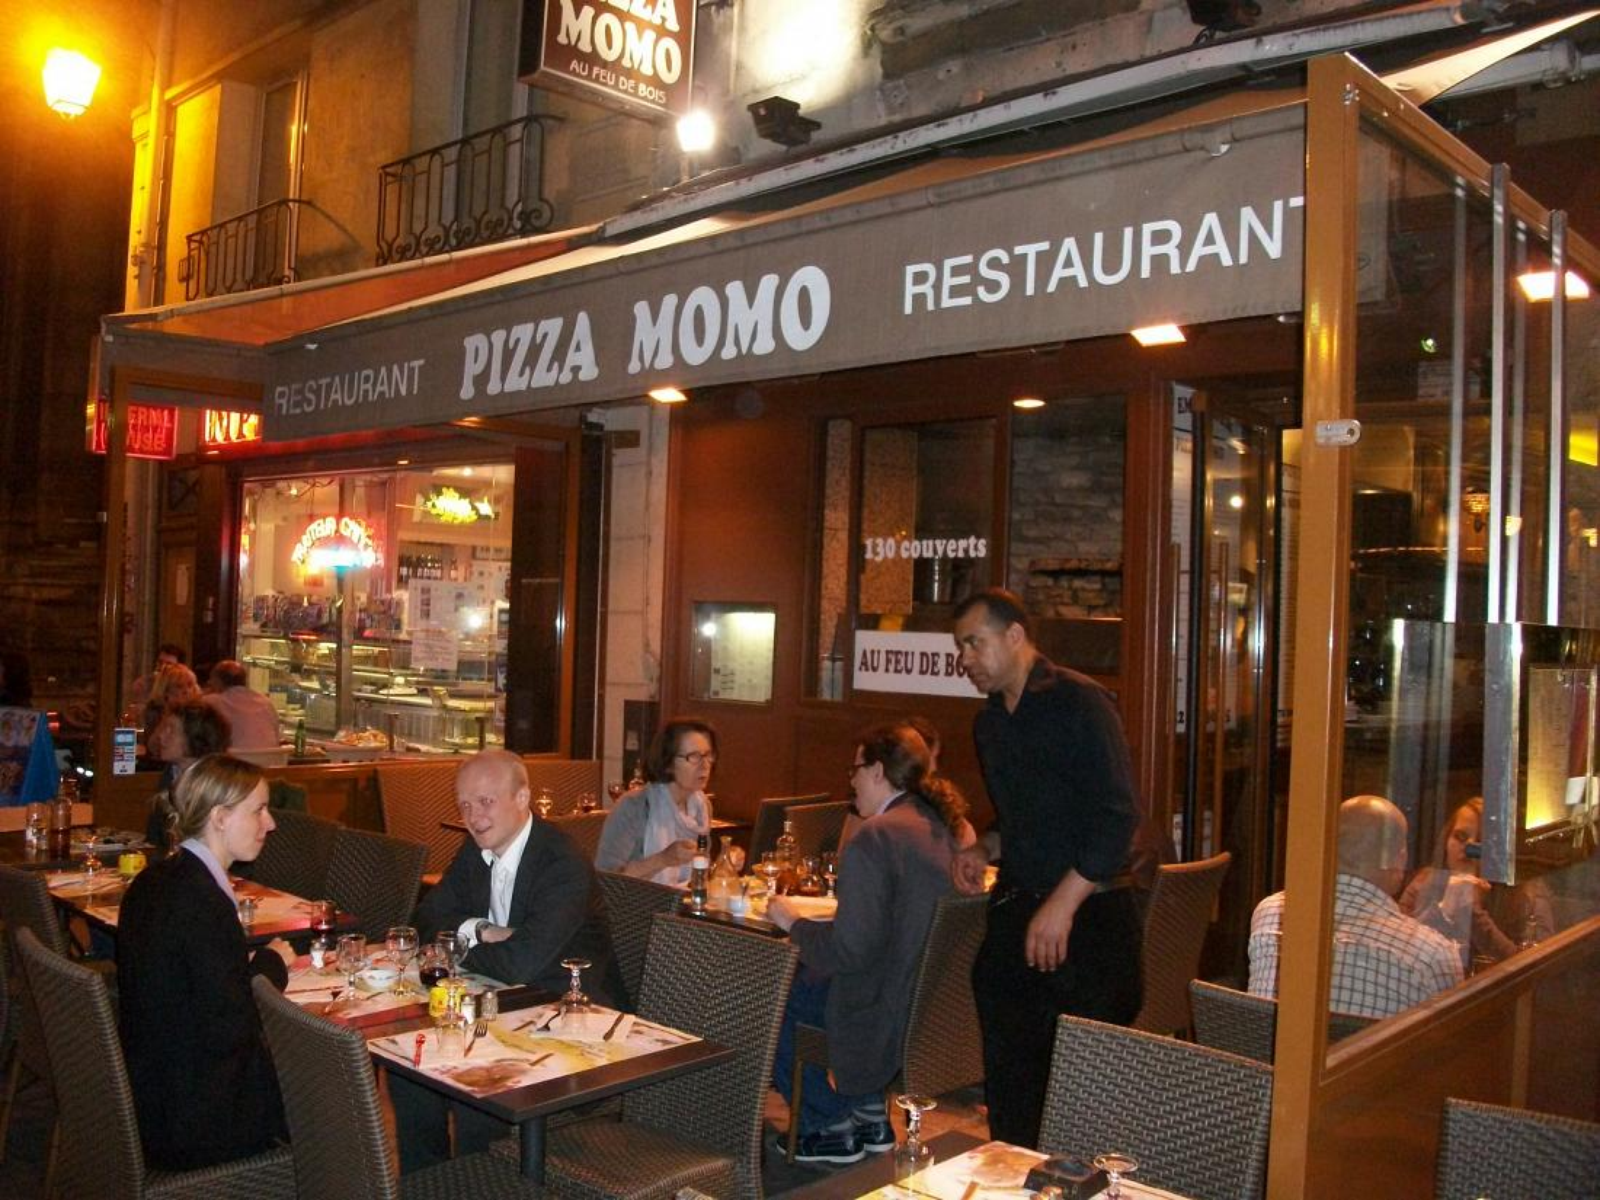 pizza momo restaurant italien paris 4e pizzeria ma. Black Bedroom Furniture Sets. Home Design Ideas